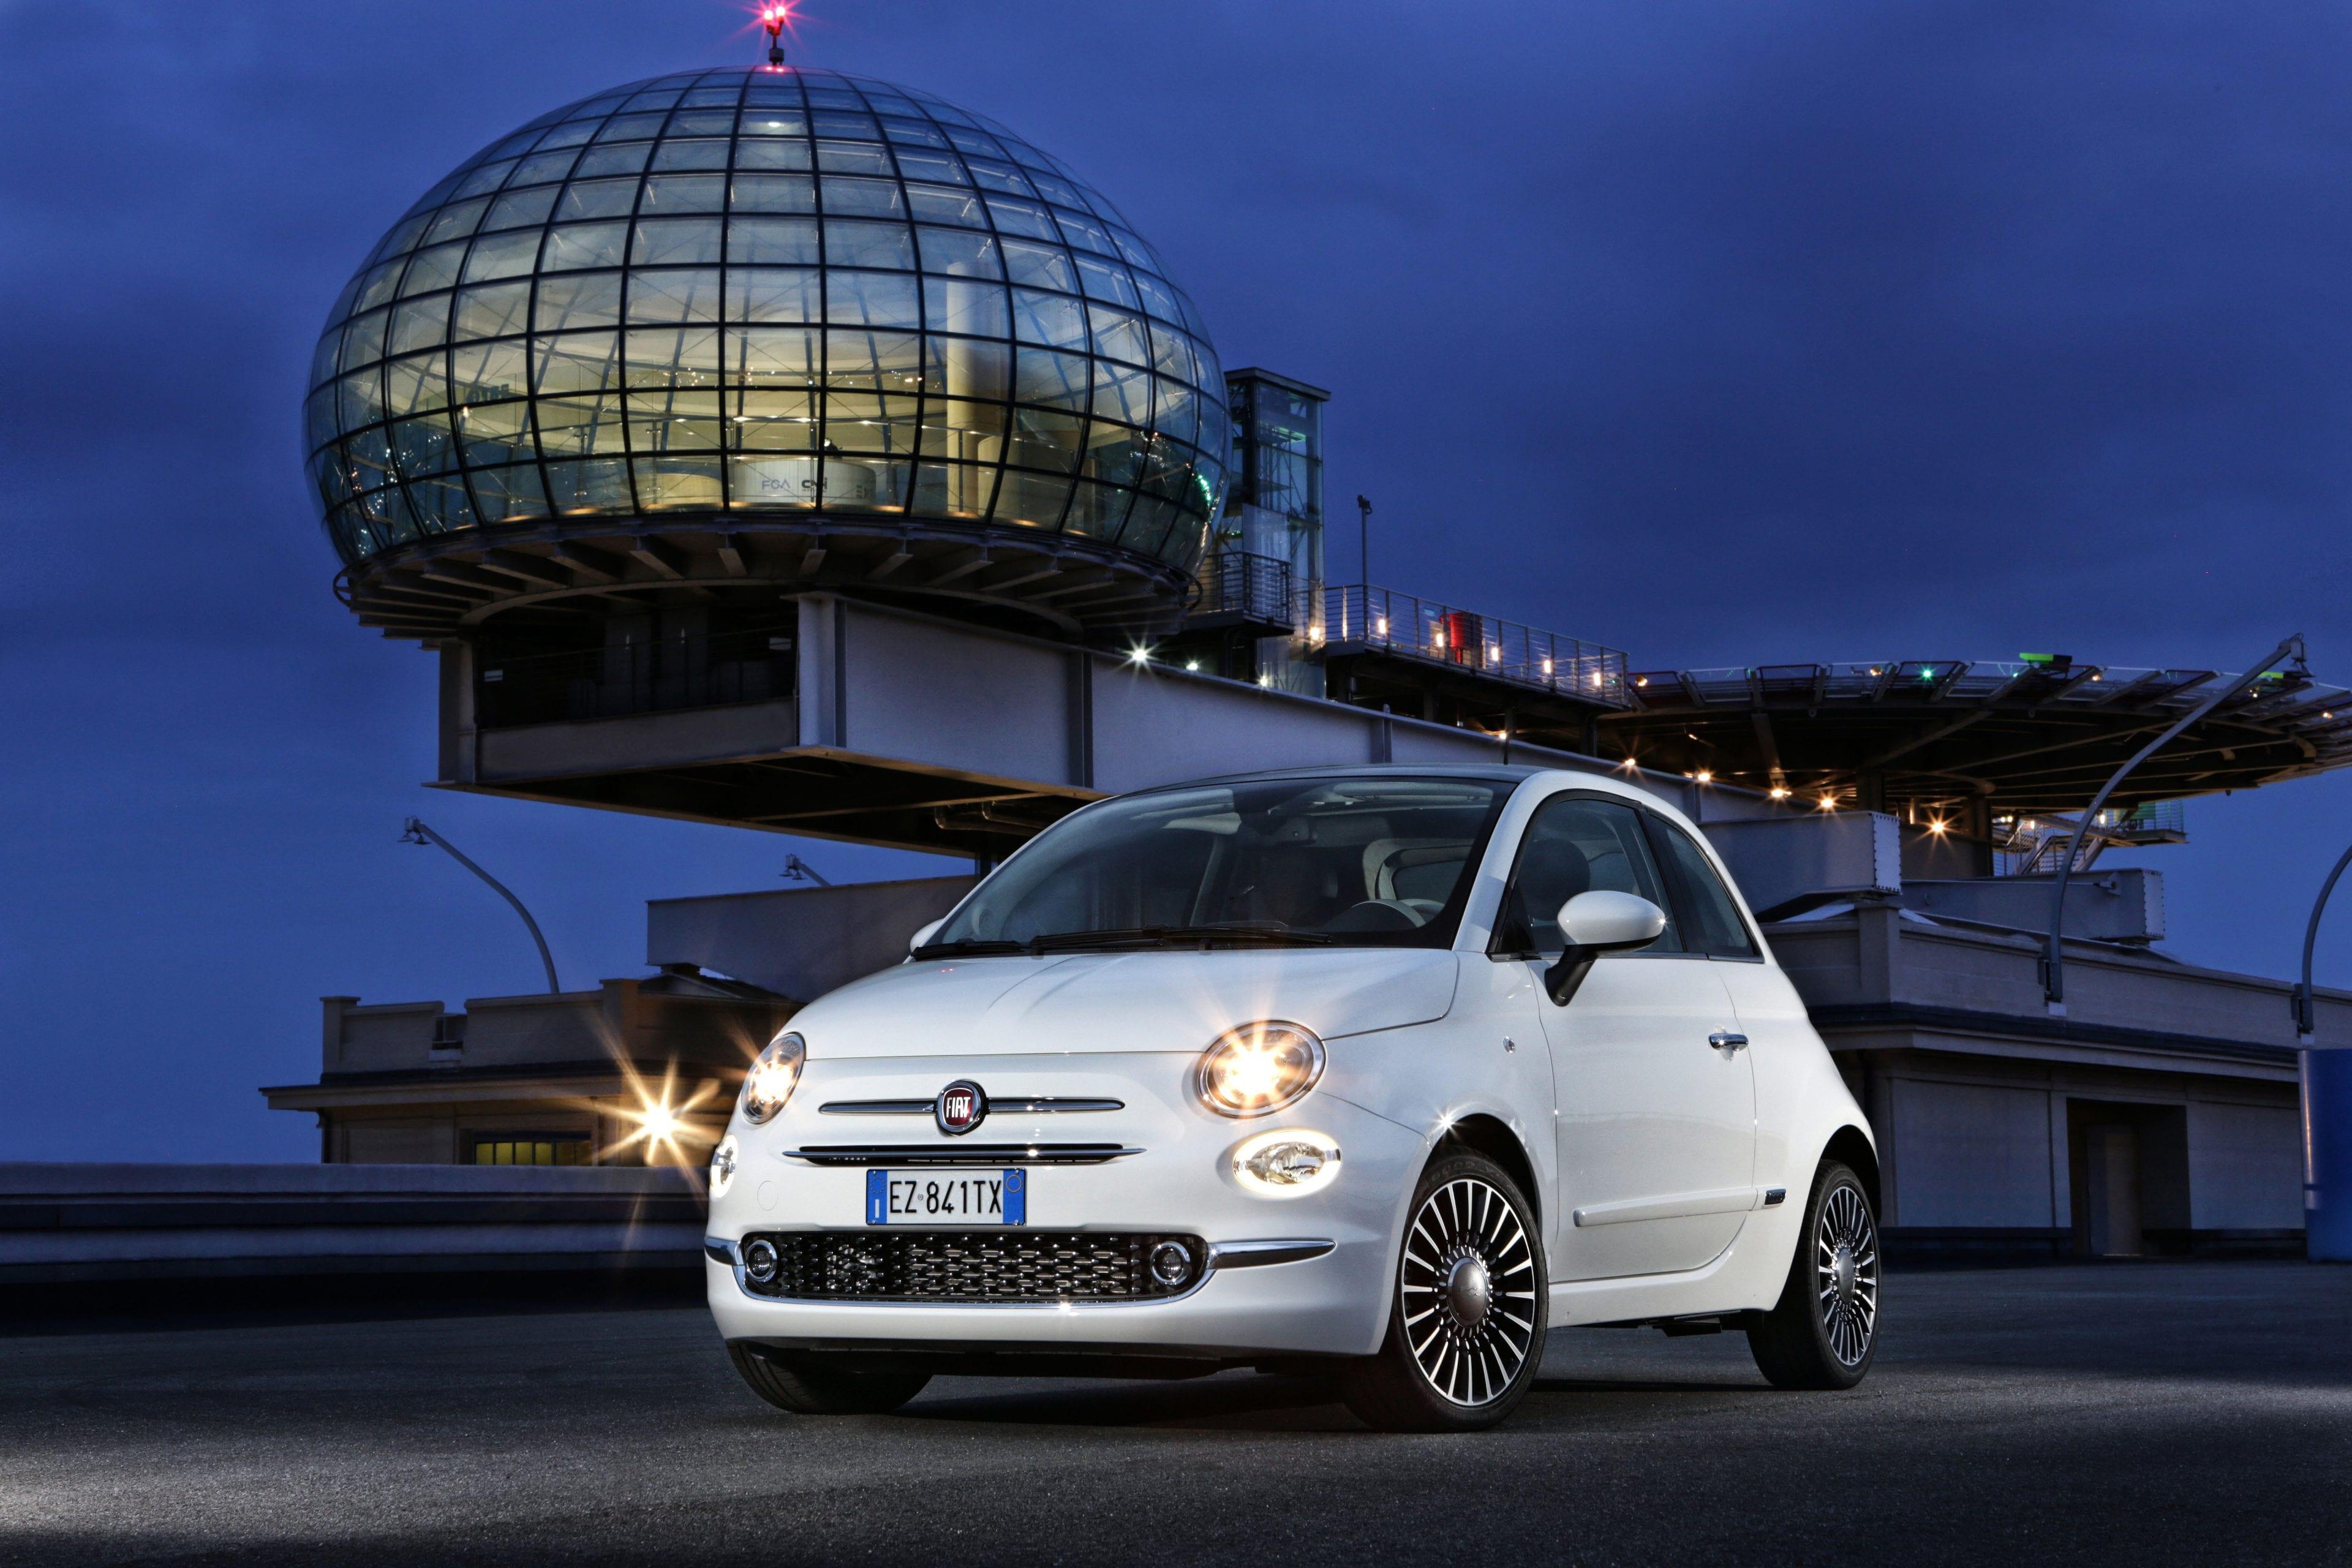 Fiat 500 wit voorkant